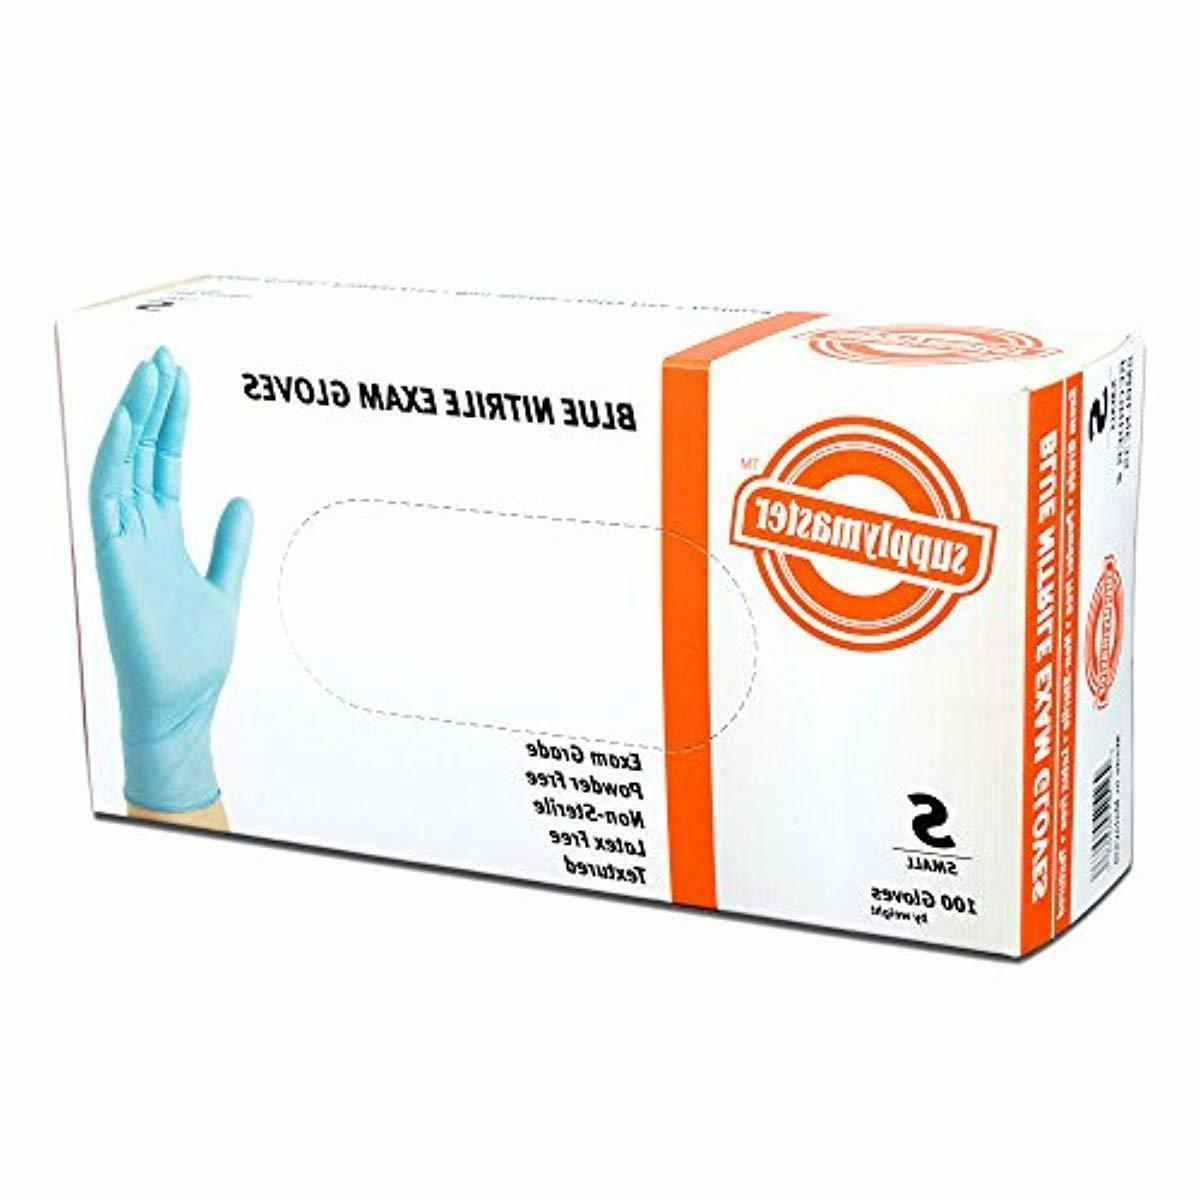 SupplyMaster Nitrile Disposable Gloves,Powder Free,Textured 400